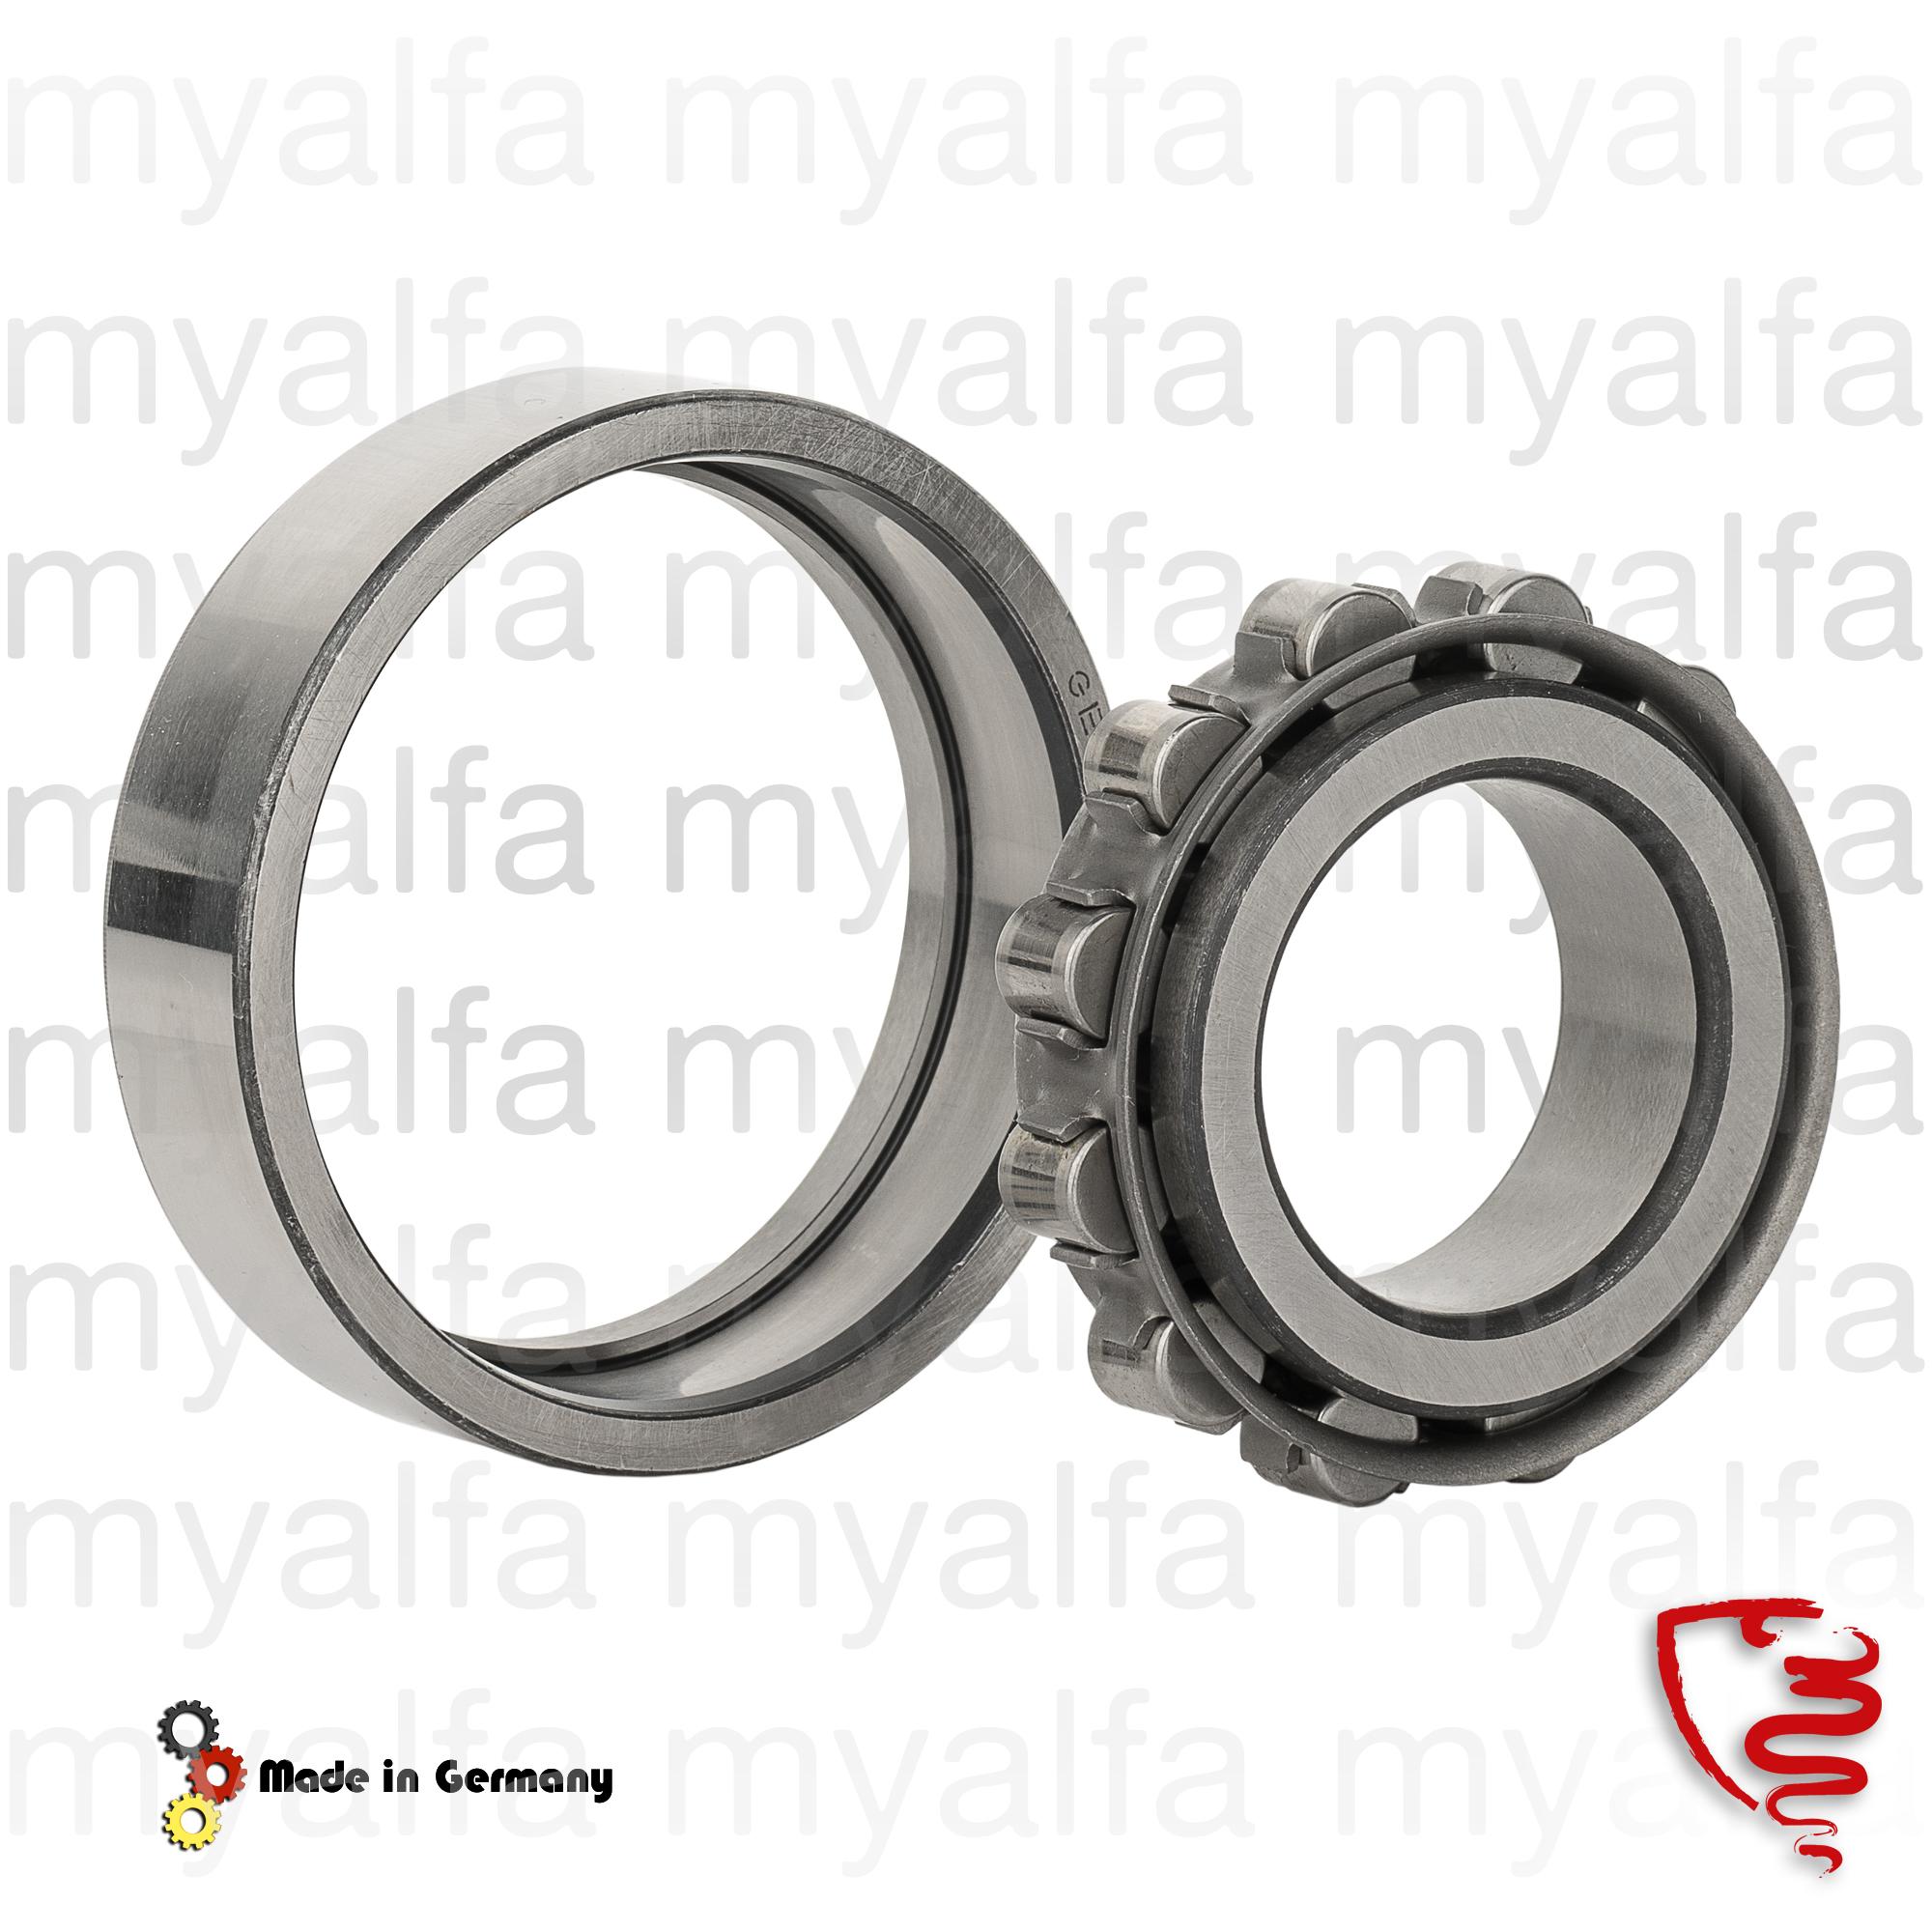 1300-1750 rear bearing layshaft for 105/115, Gearbox, Countershaft/Bearings